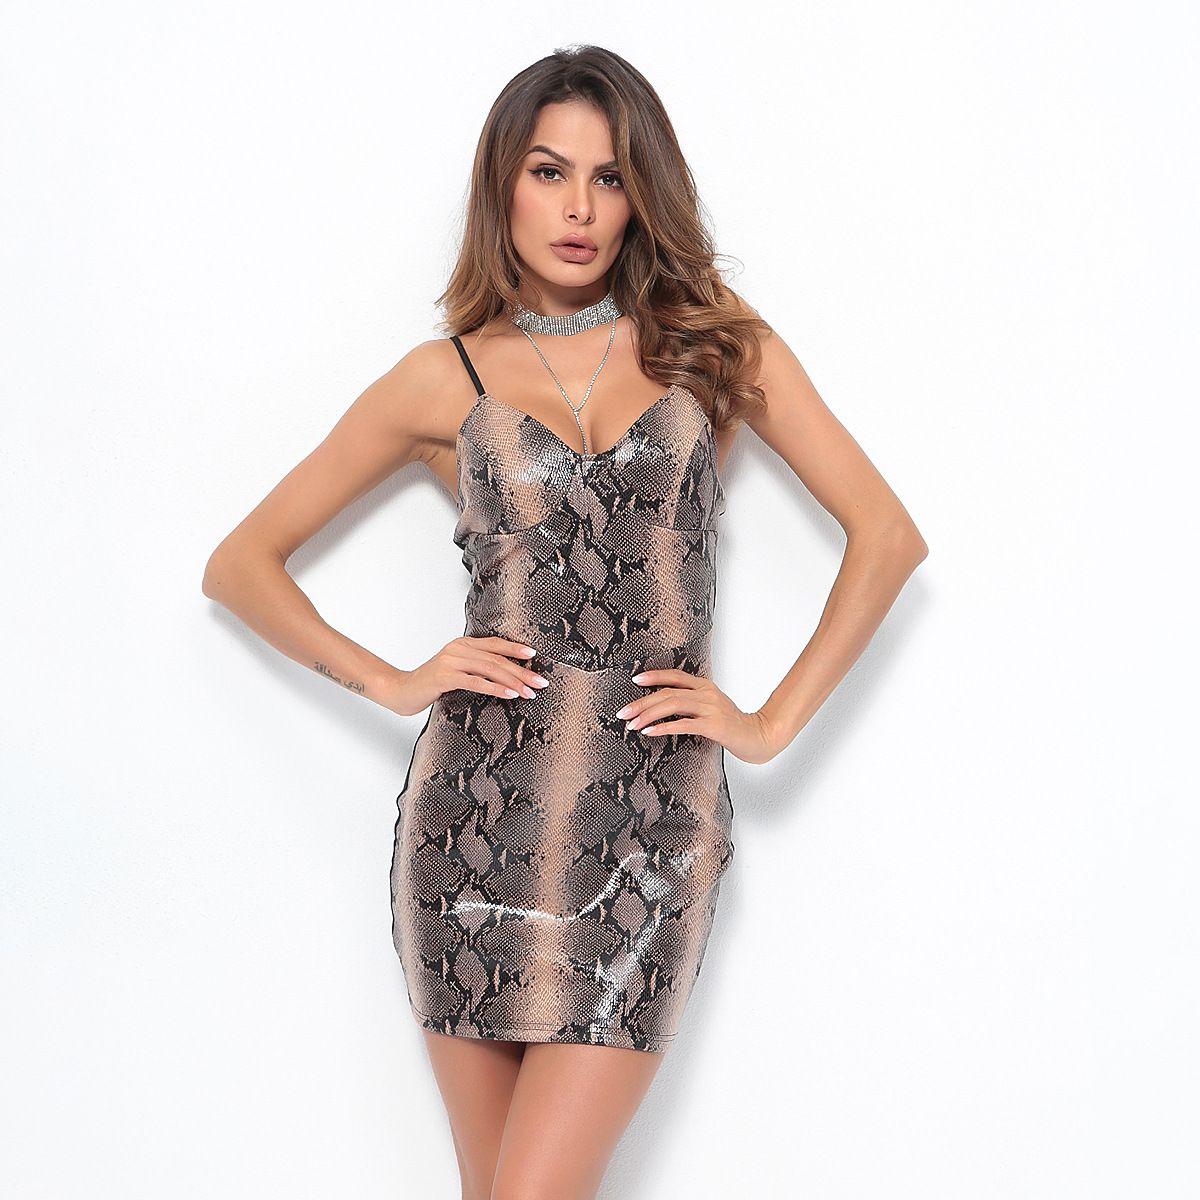 2019 Women Clothing Sleeveless V Neck Spliced Snakeskin Print Bodycon Dress  Female Sexy Fashion Slim Mini Pencil Dresses D5908 Sweater Dresses Lace  Dresses ... bd151d5bb